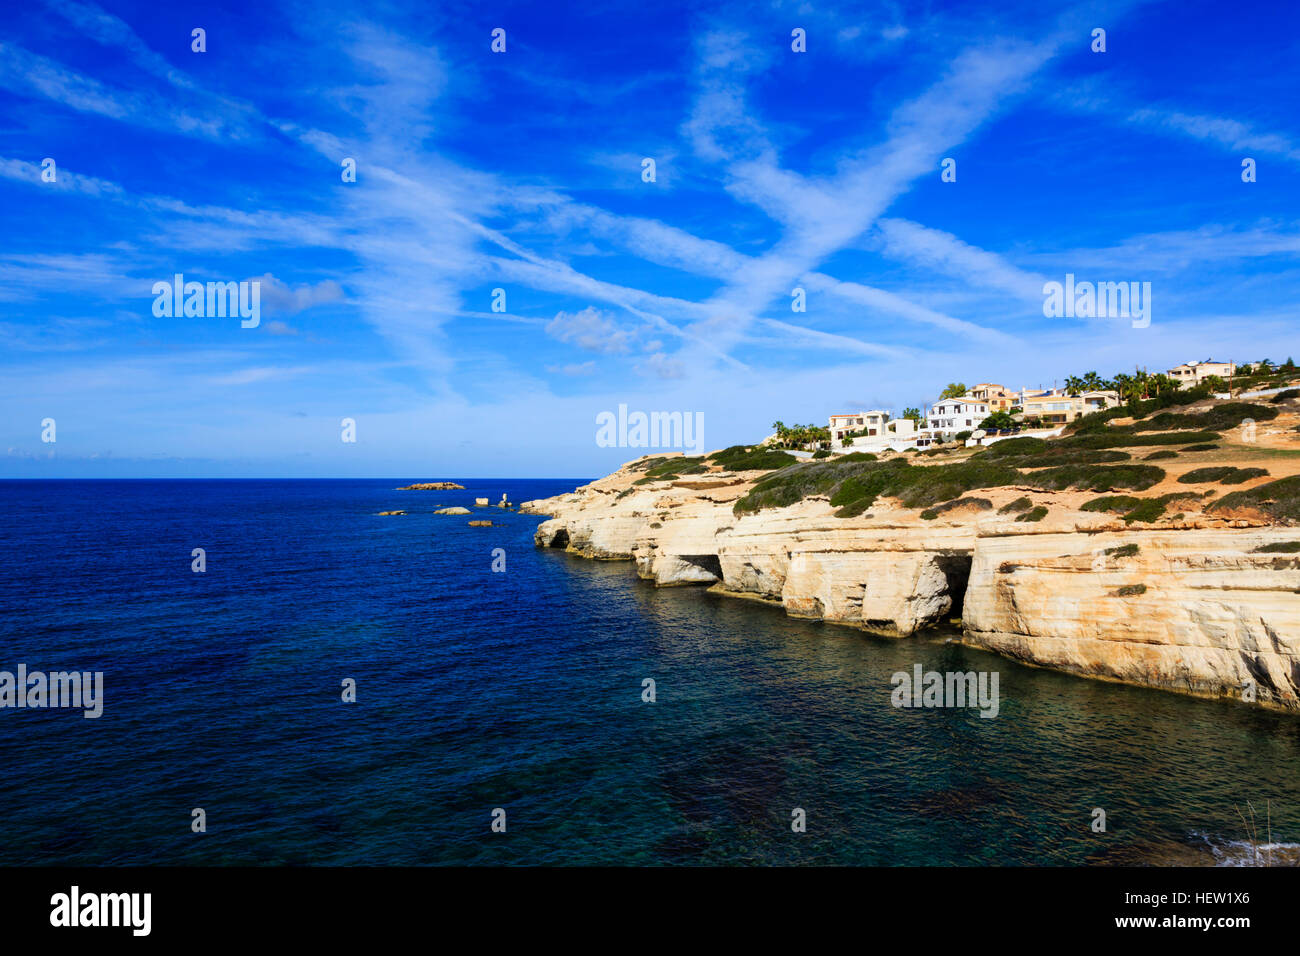 Coastal erosion at Seacaves, Paphos, Cyprus. - Stock Image